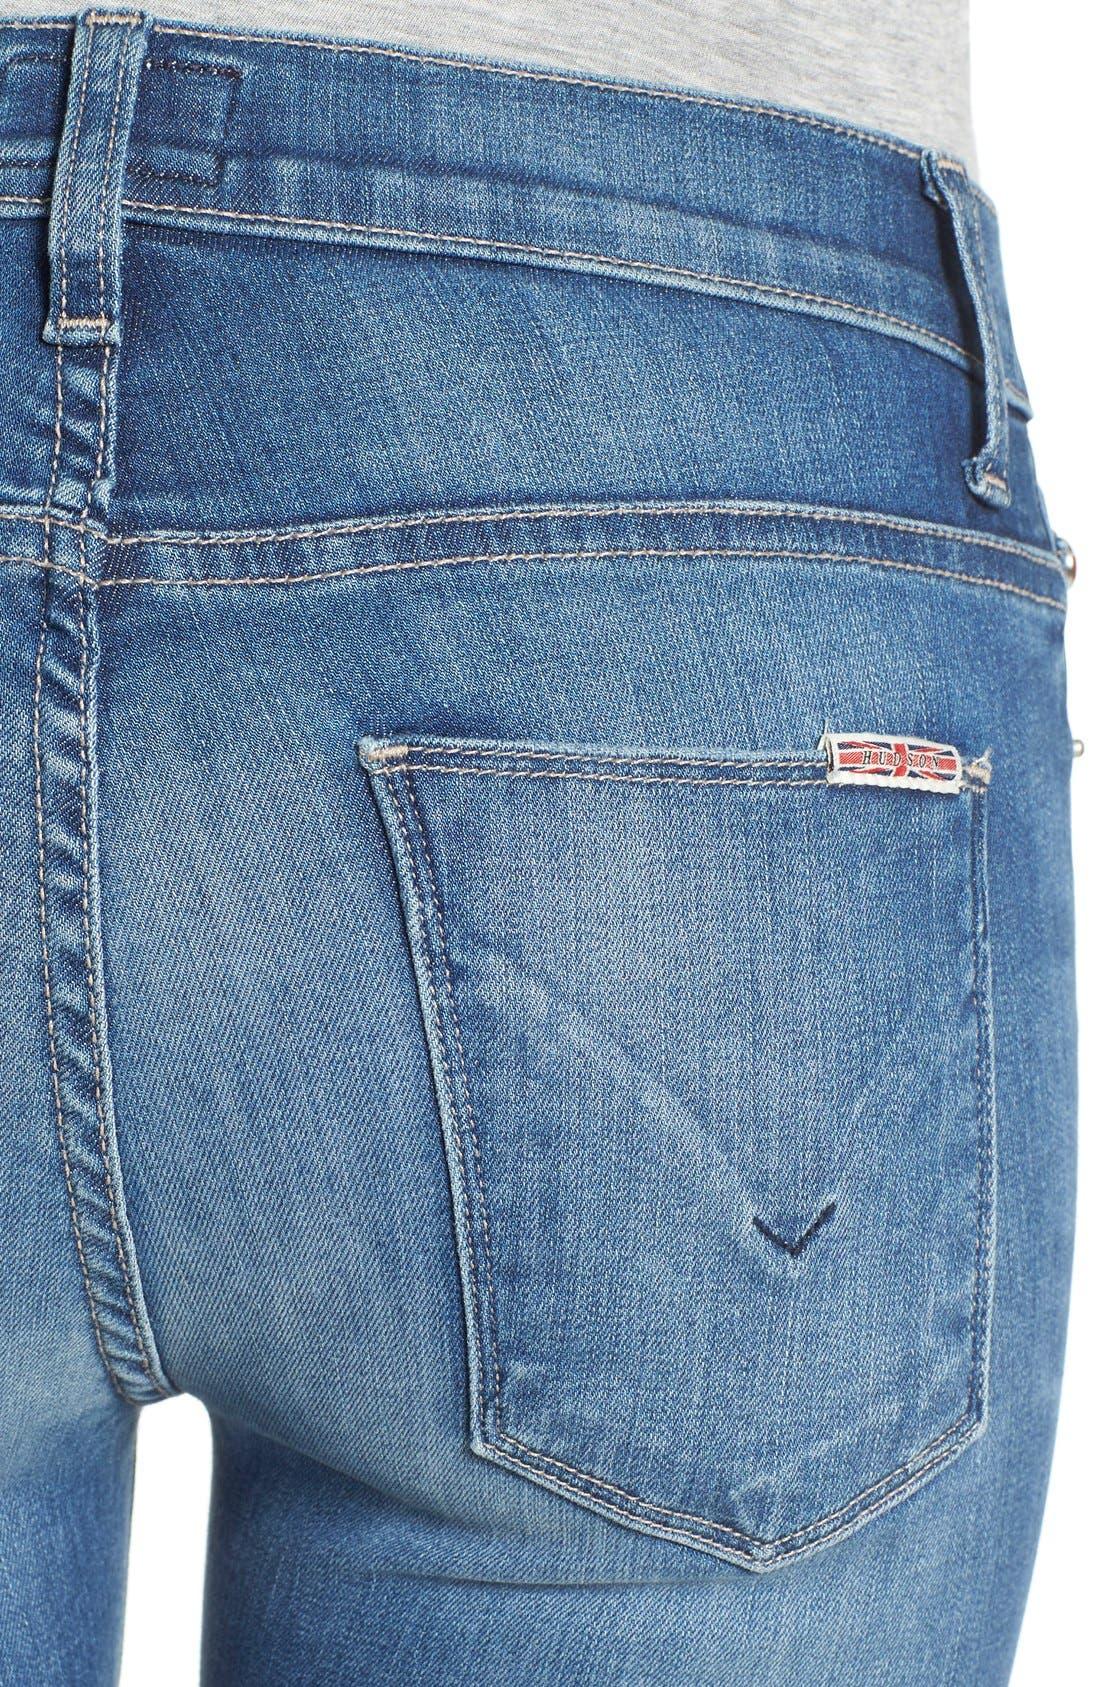 'Nico' Super Skinny Jeans,                             Alternate thumbnail 27, color,